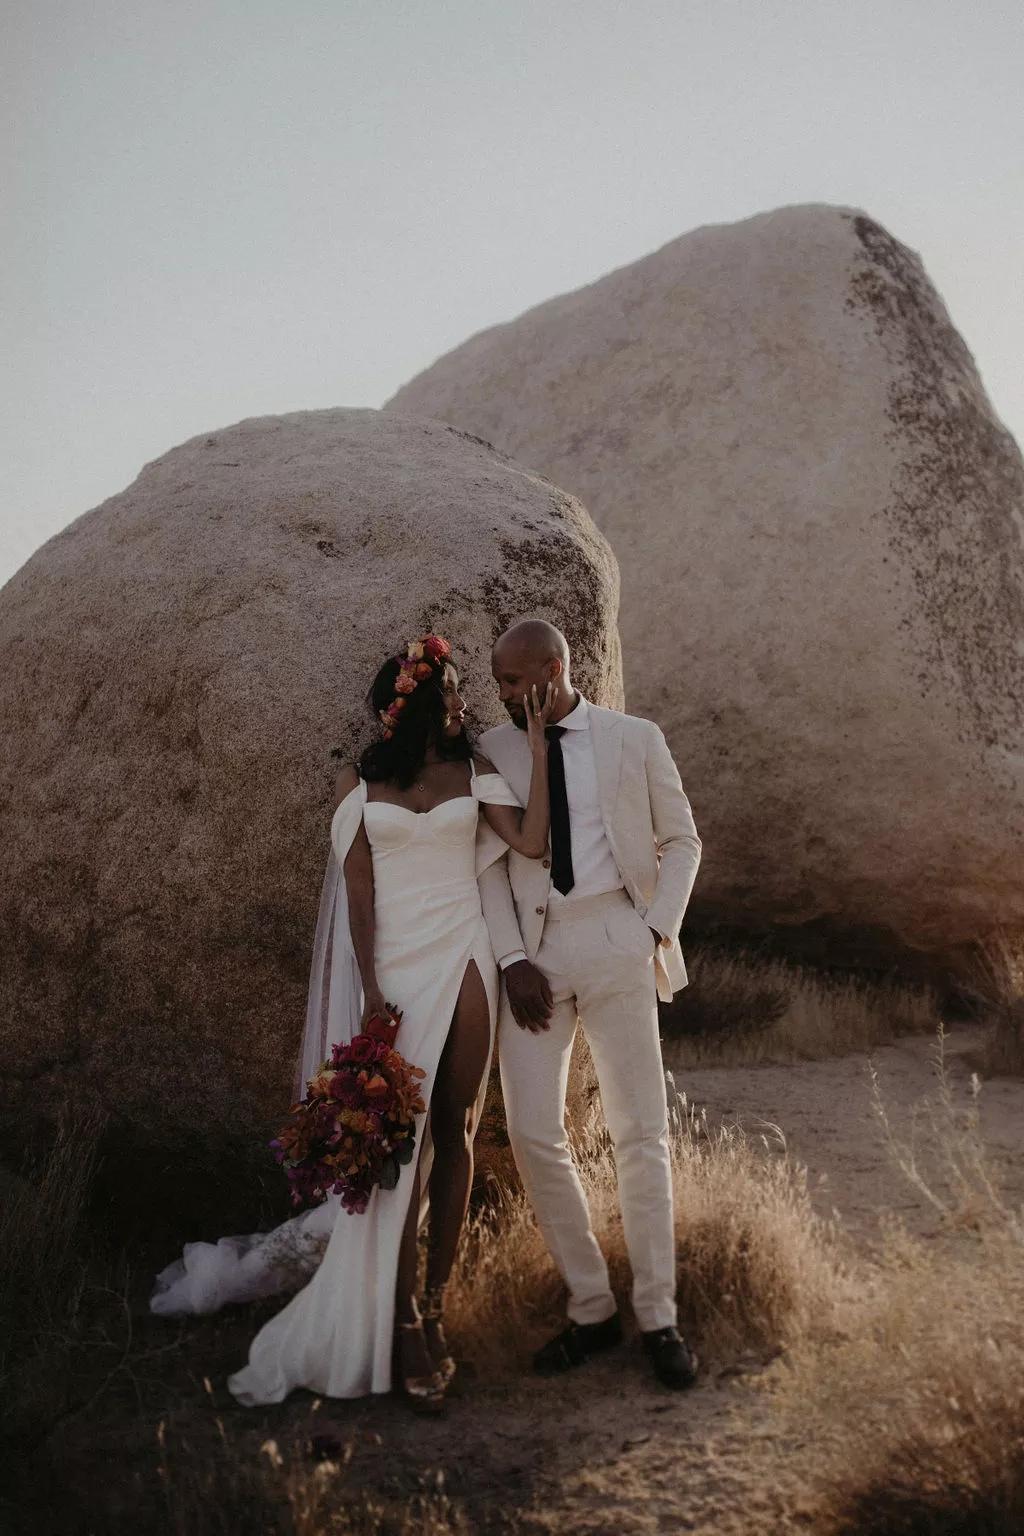 bKHryAsD80c - Найти свадебного ведущего оказалось проще простого